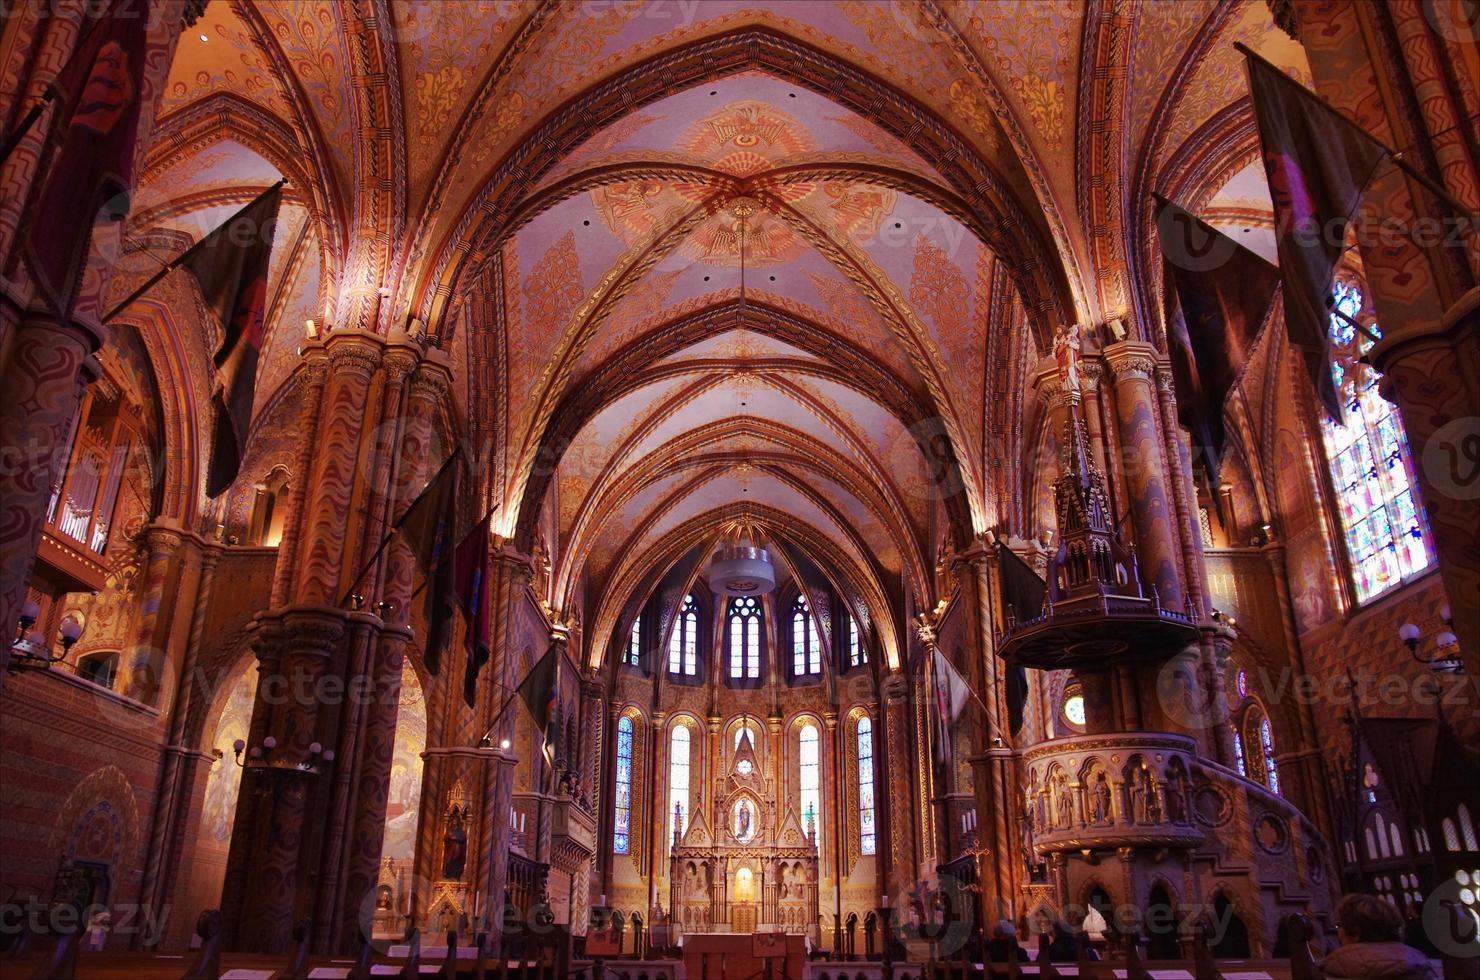 chiesa di mattia, budapest foto